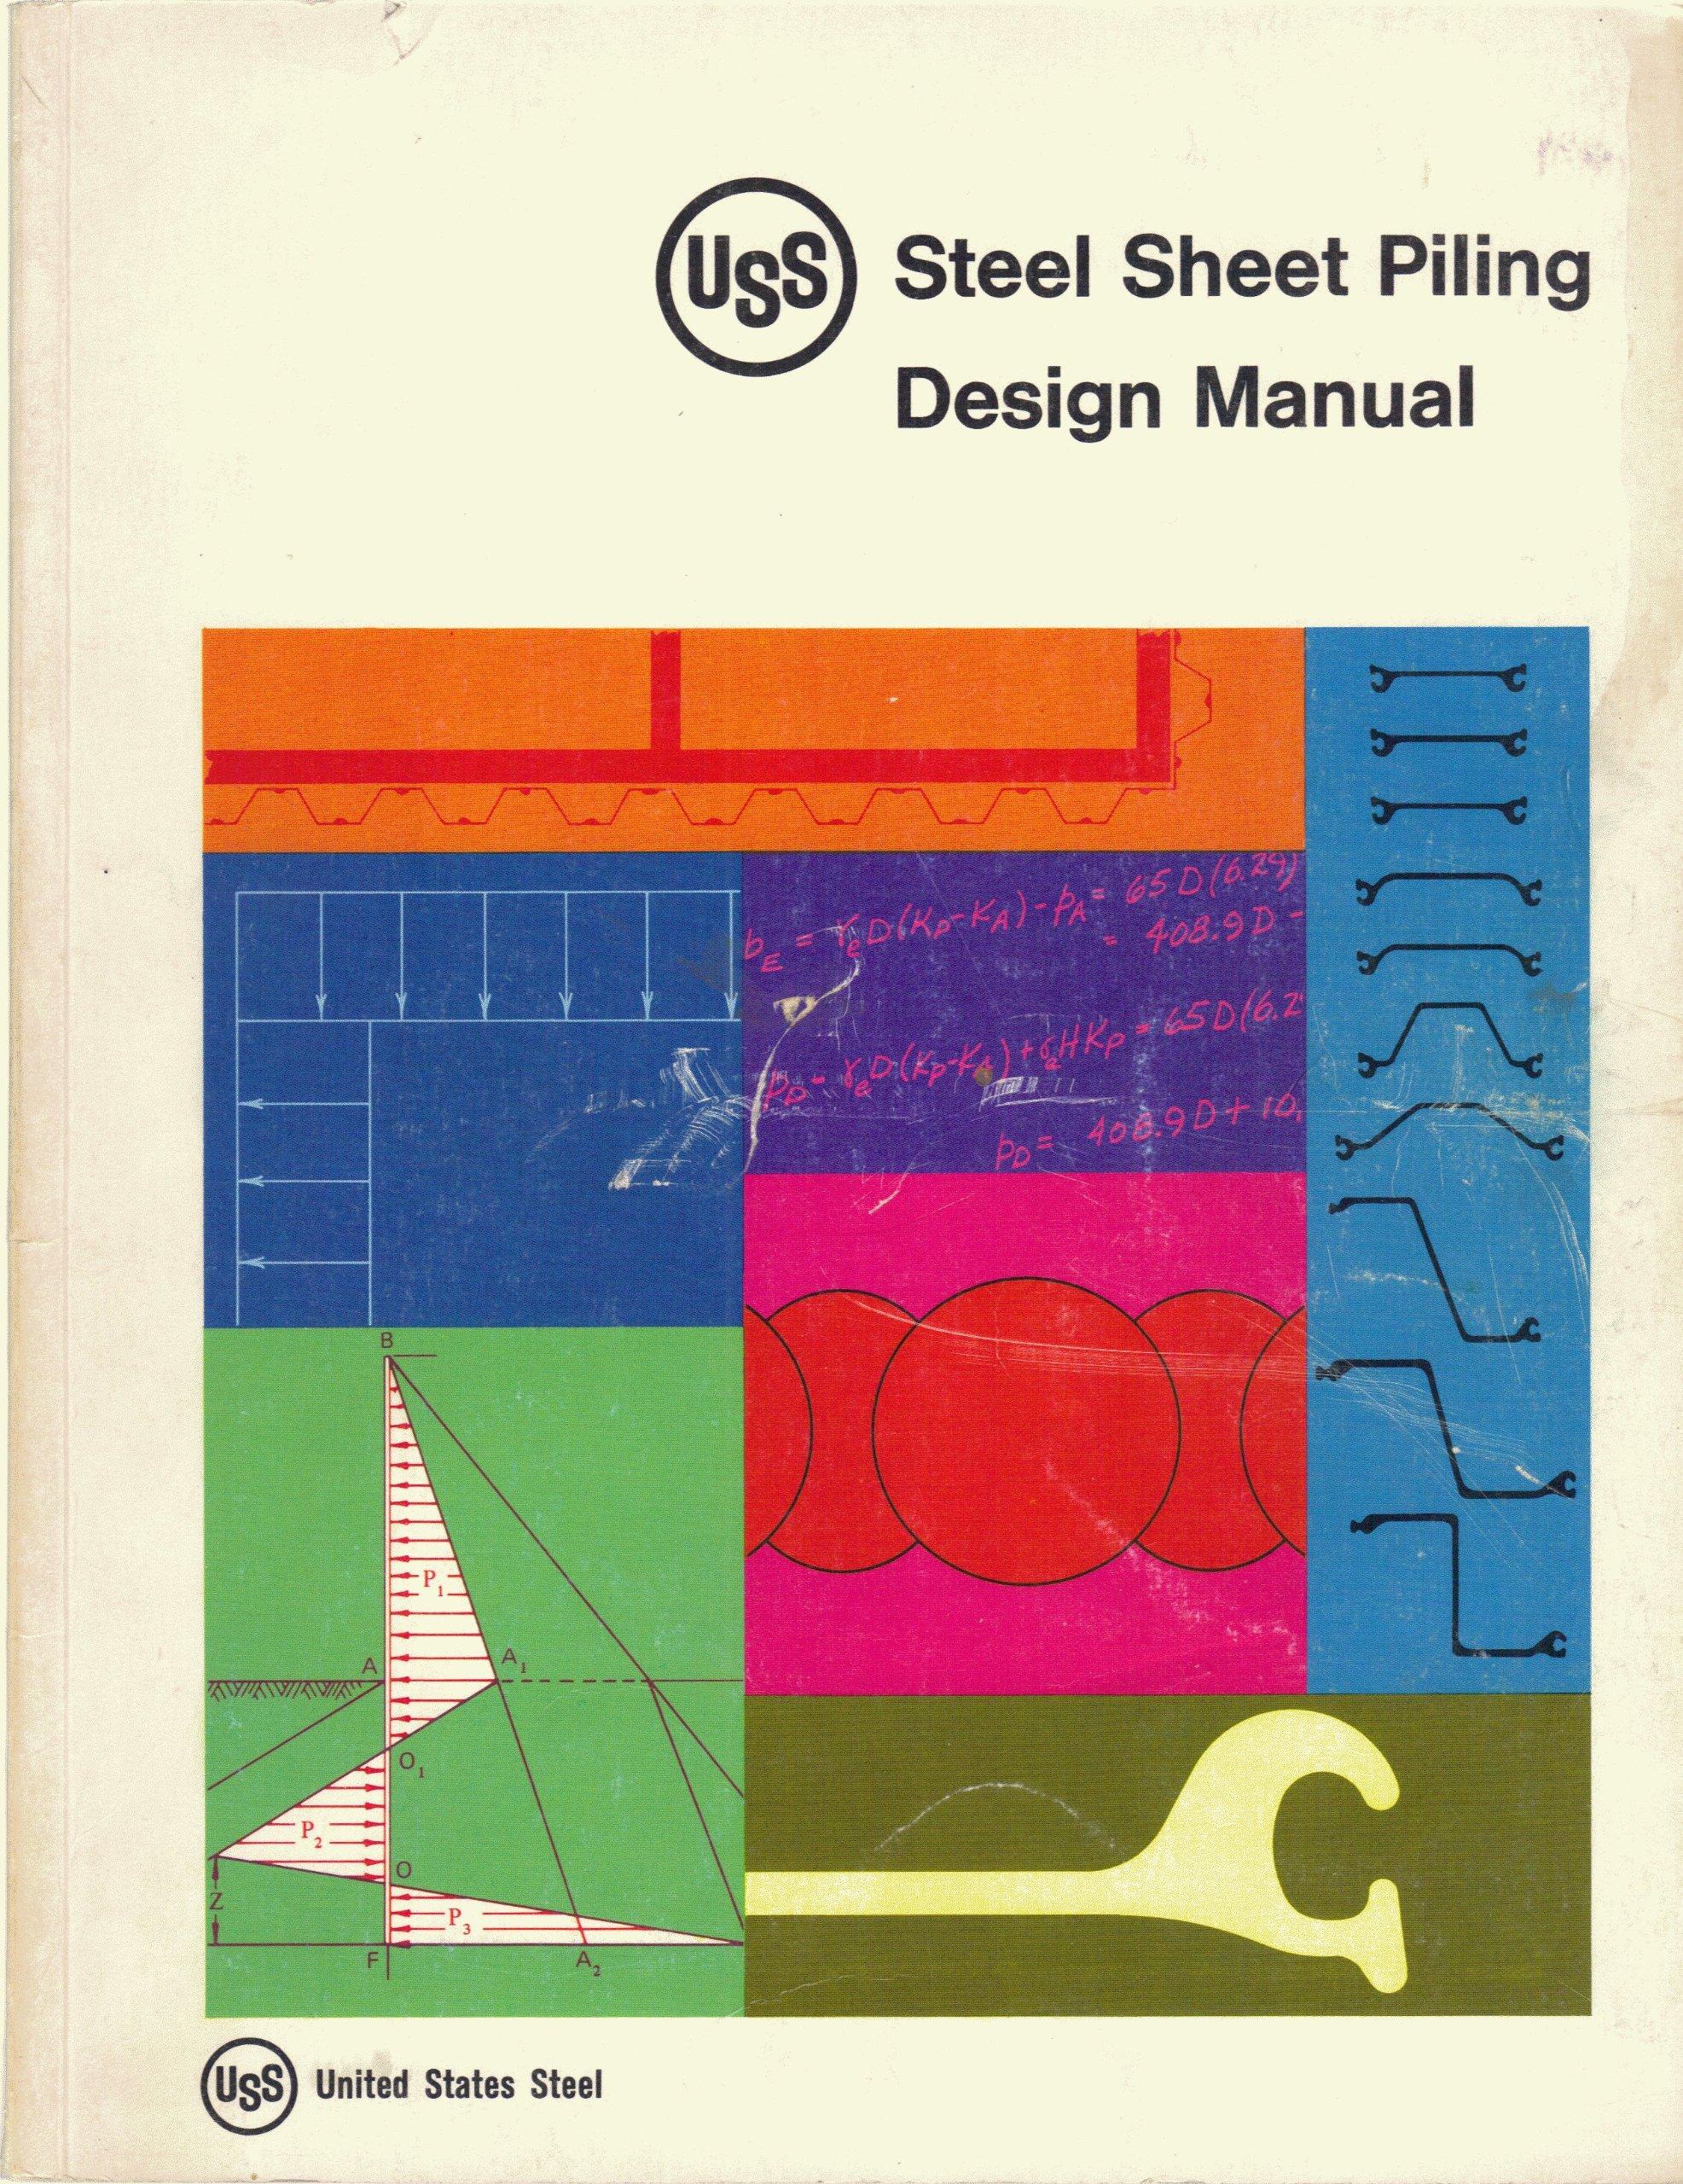 USS Steel Sheet Piling Design Manual: United States Steel: Amazon.com: Books